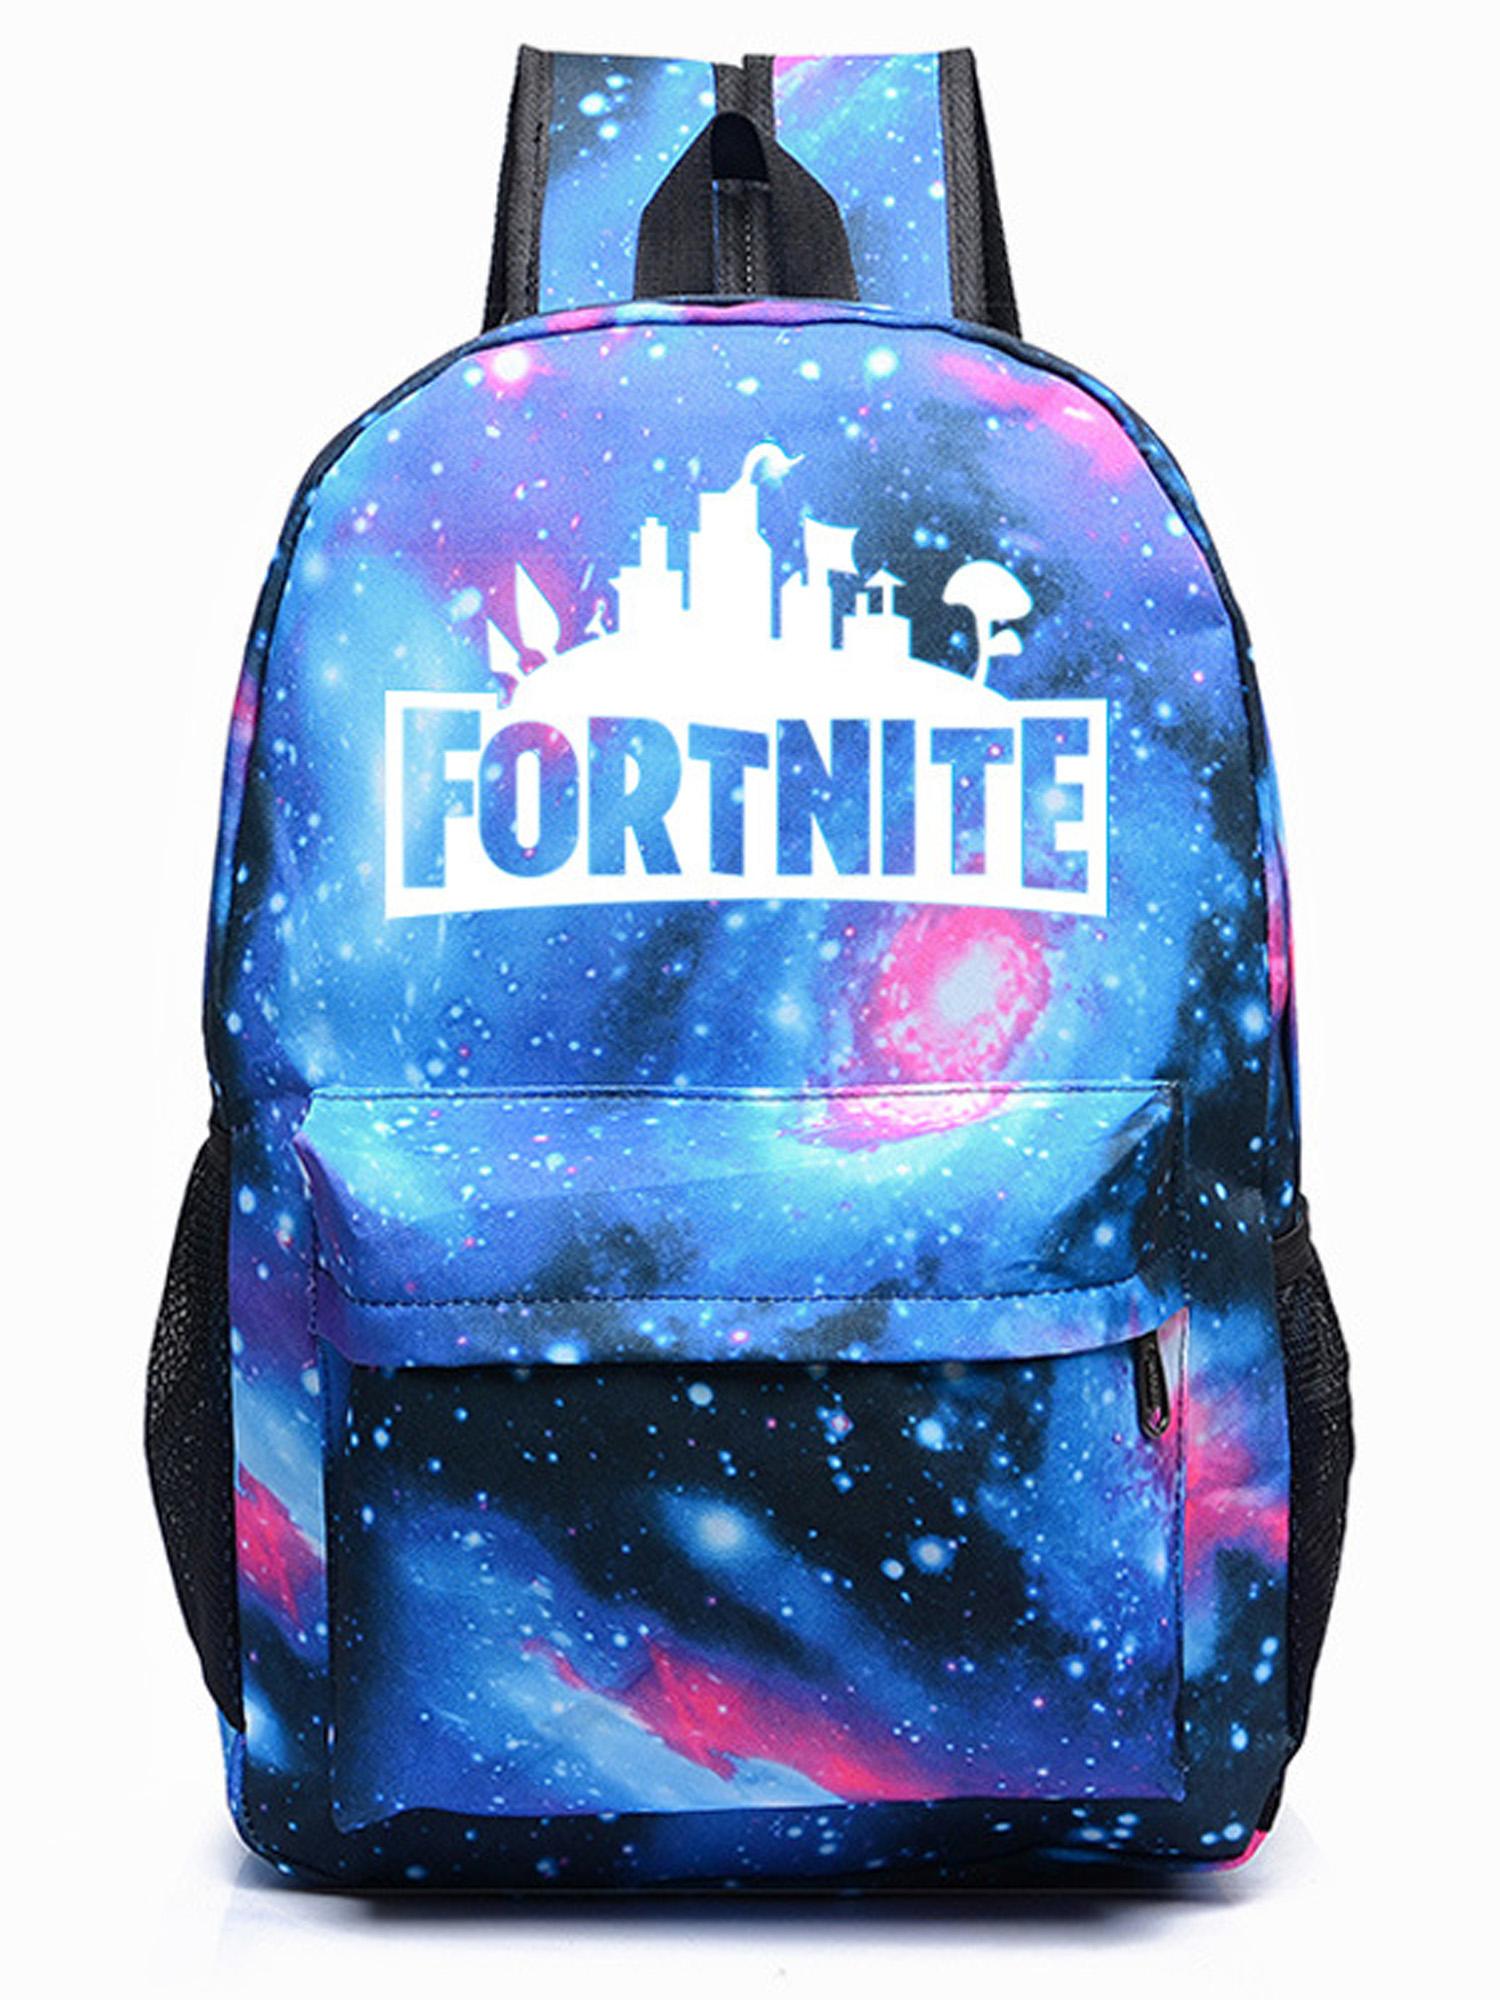 Fortnite Battle Royale Backpack Luminous Game Fortnite Schoo